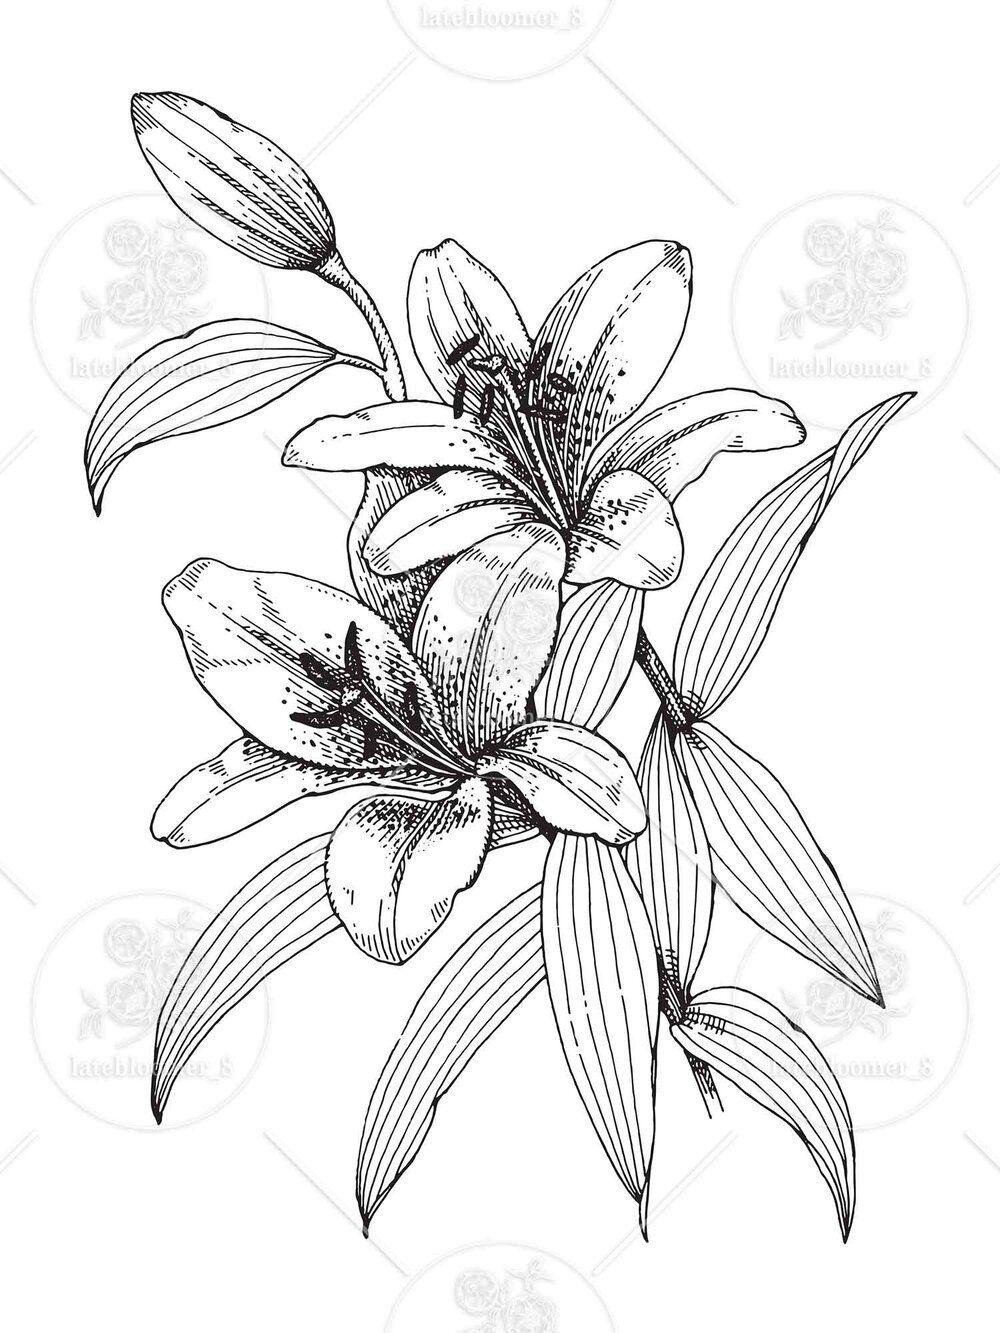 Tiger Lily Sketch   PeepsBurgh